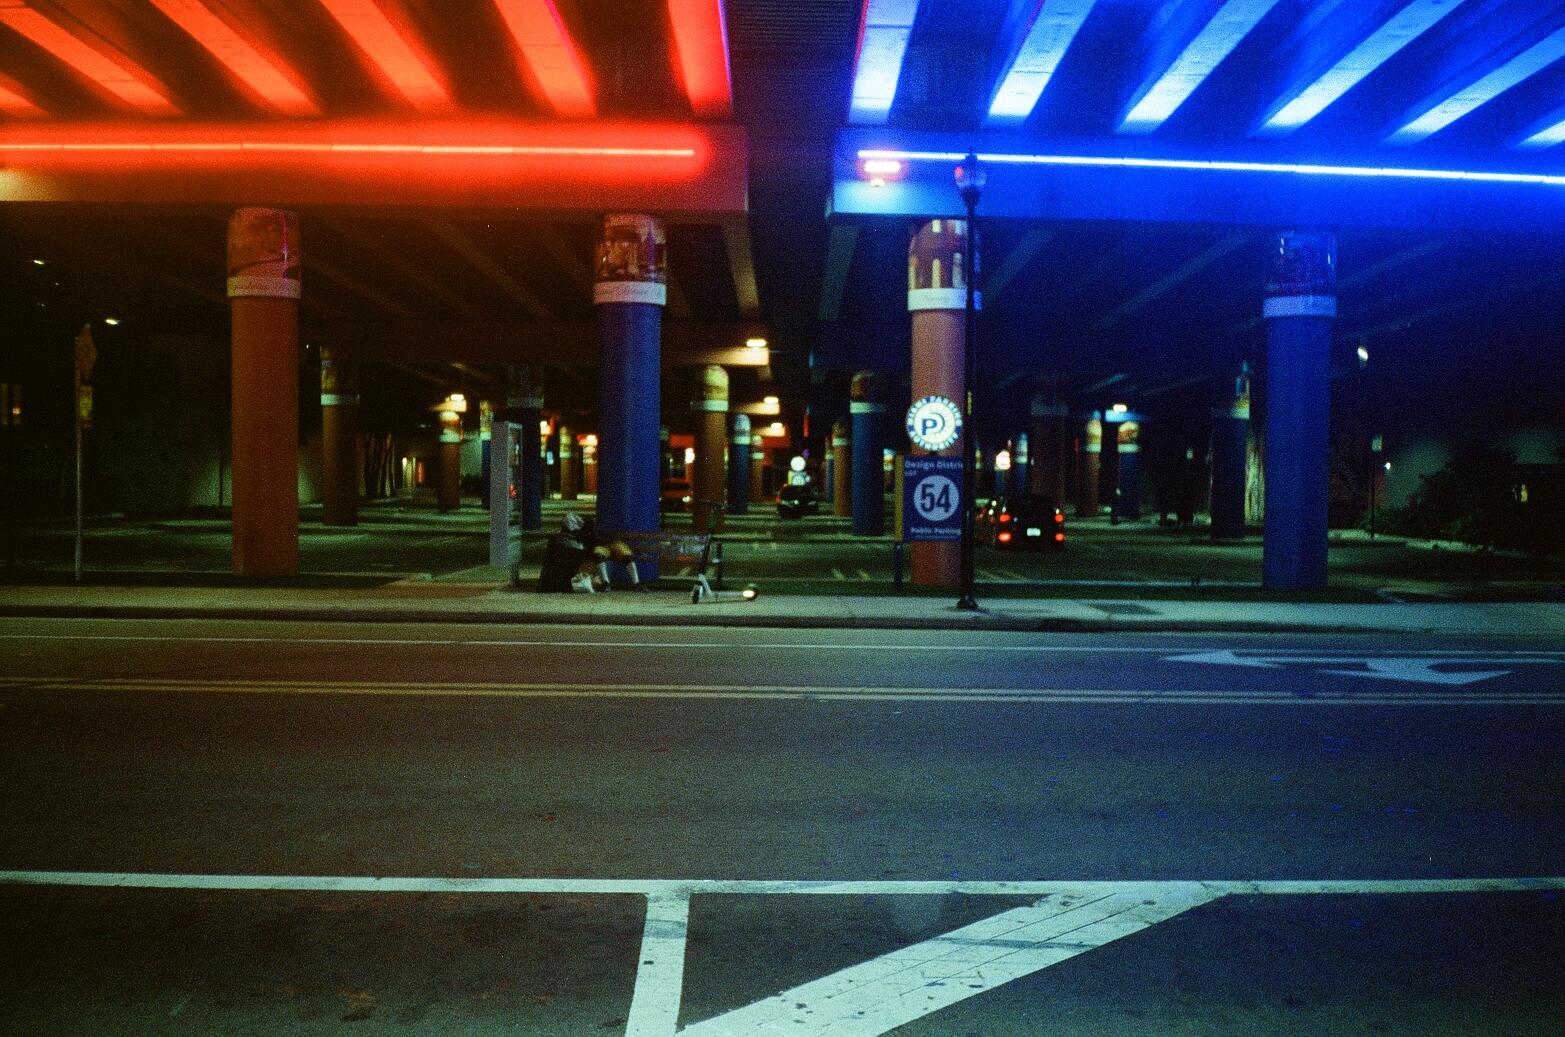 Minolta Freedom 100 at night, shot at 400 ISO Miami, FL